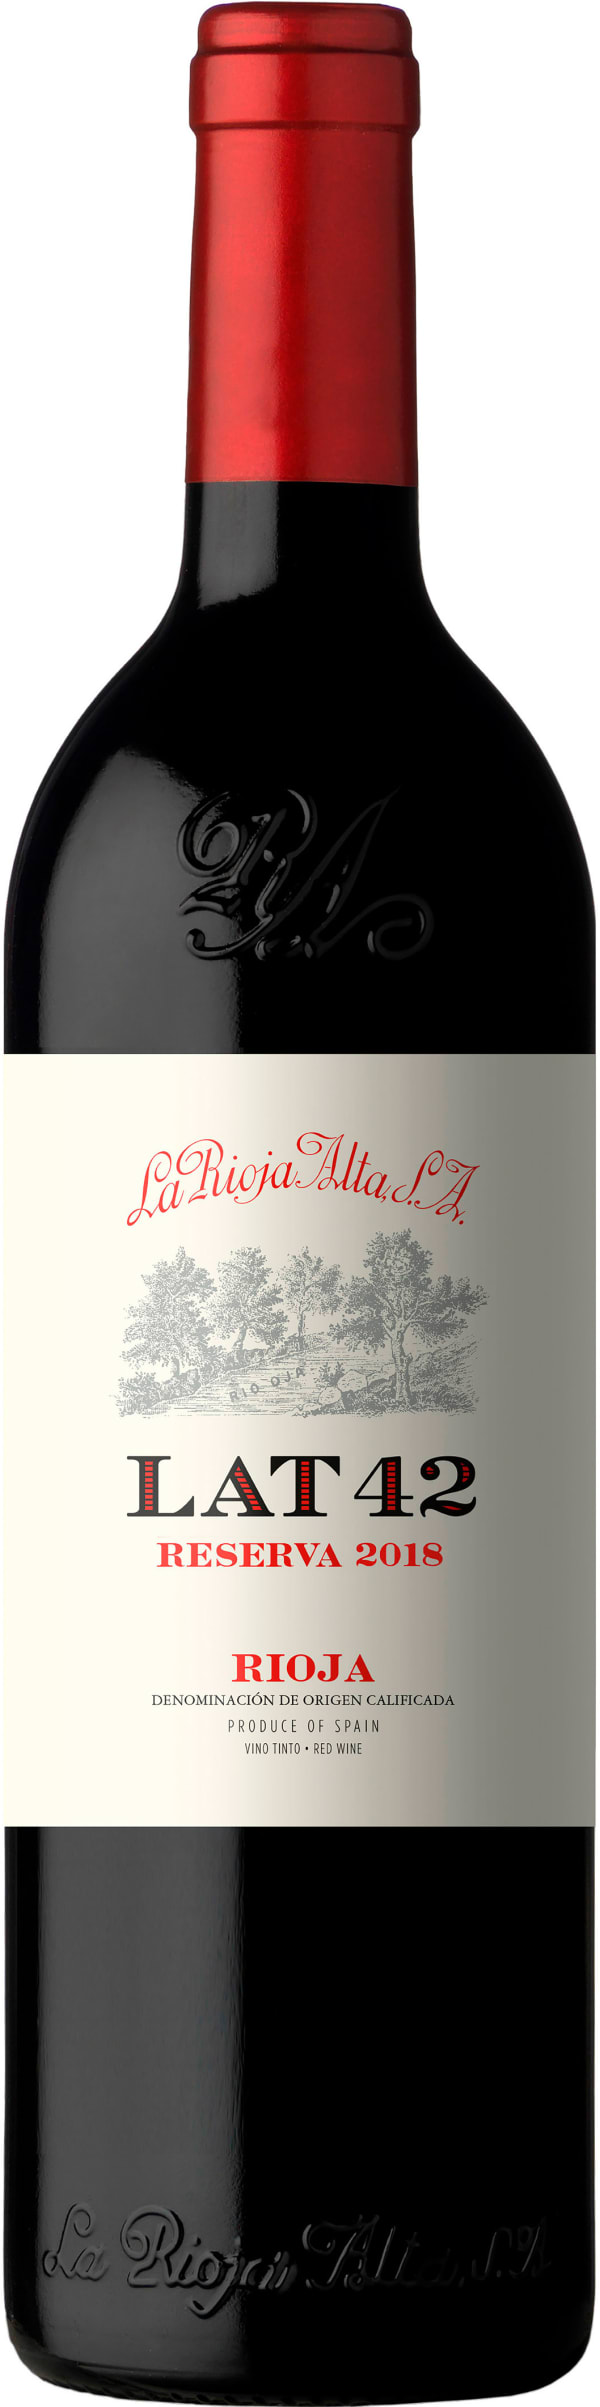 La Rioja Alta LAT 42 Reserva 2014